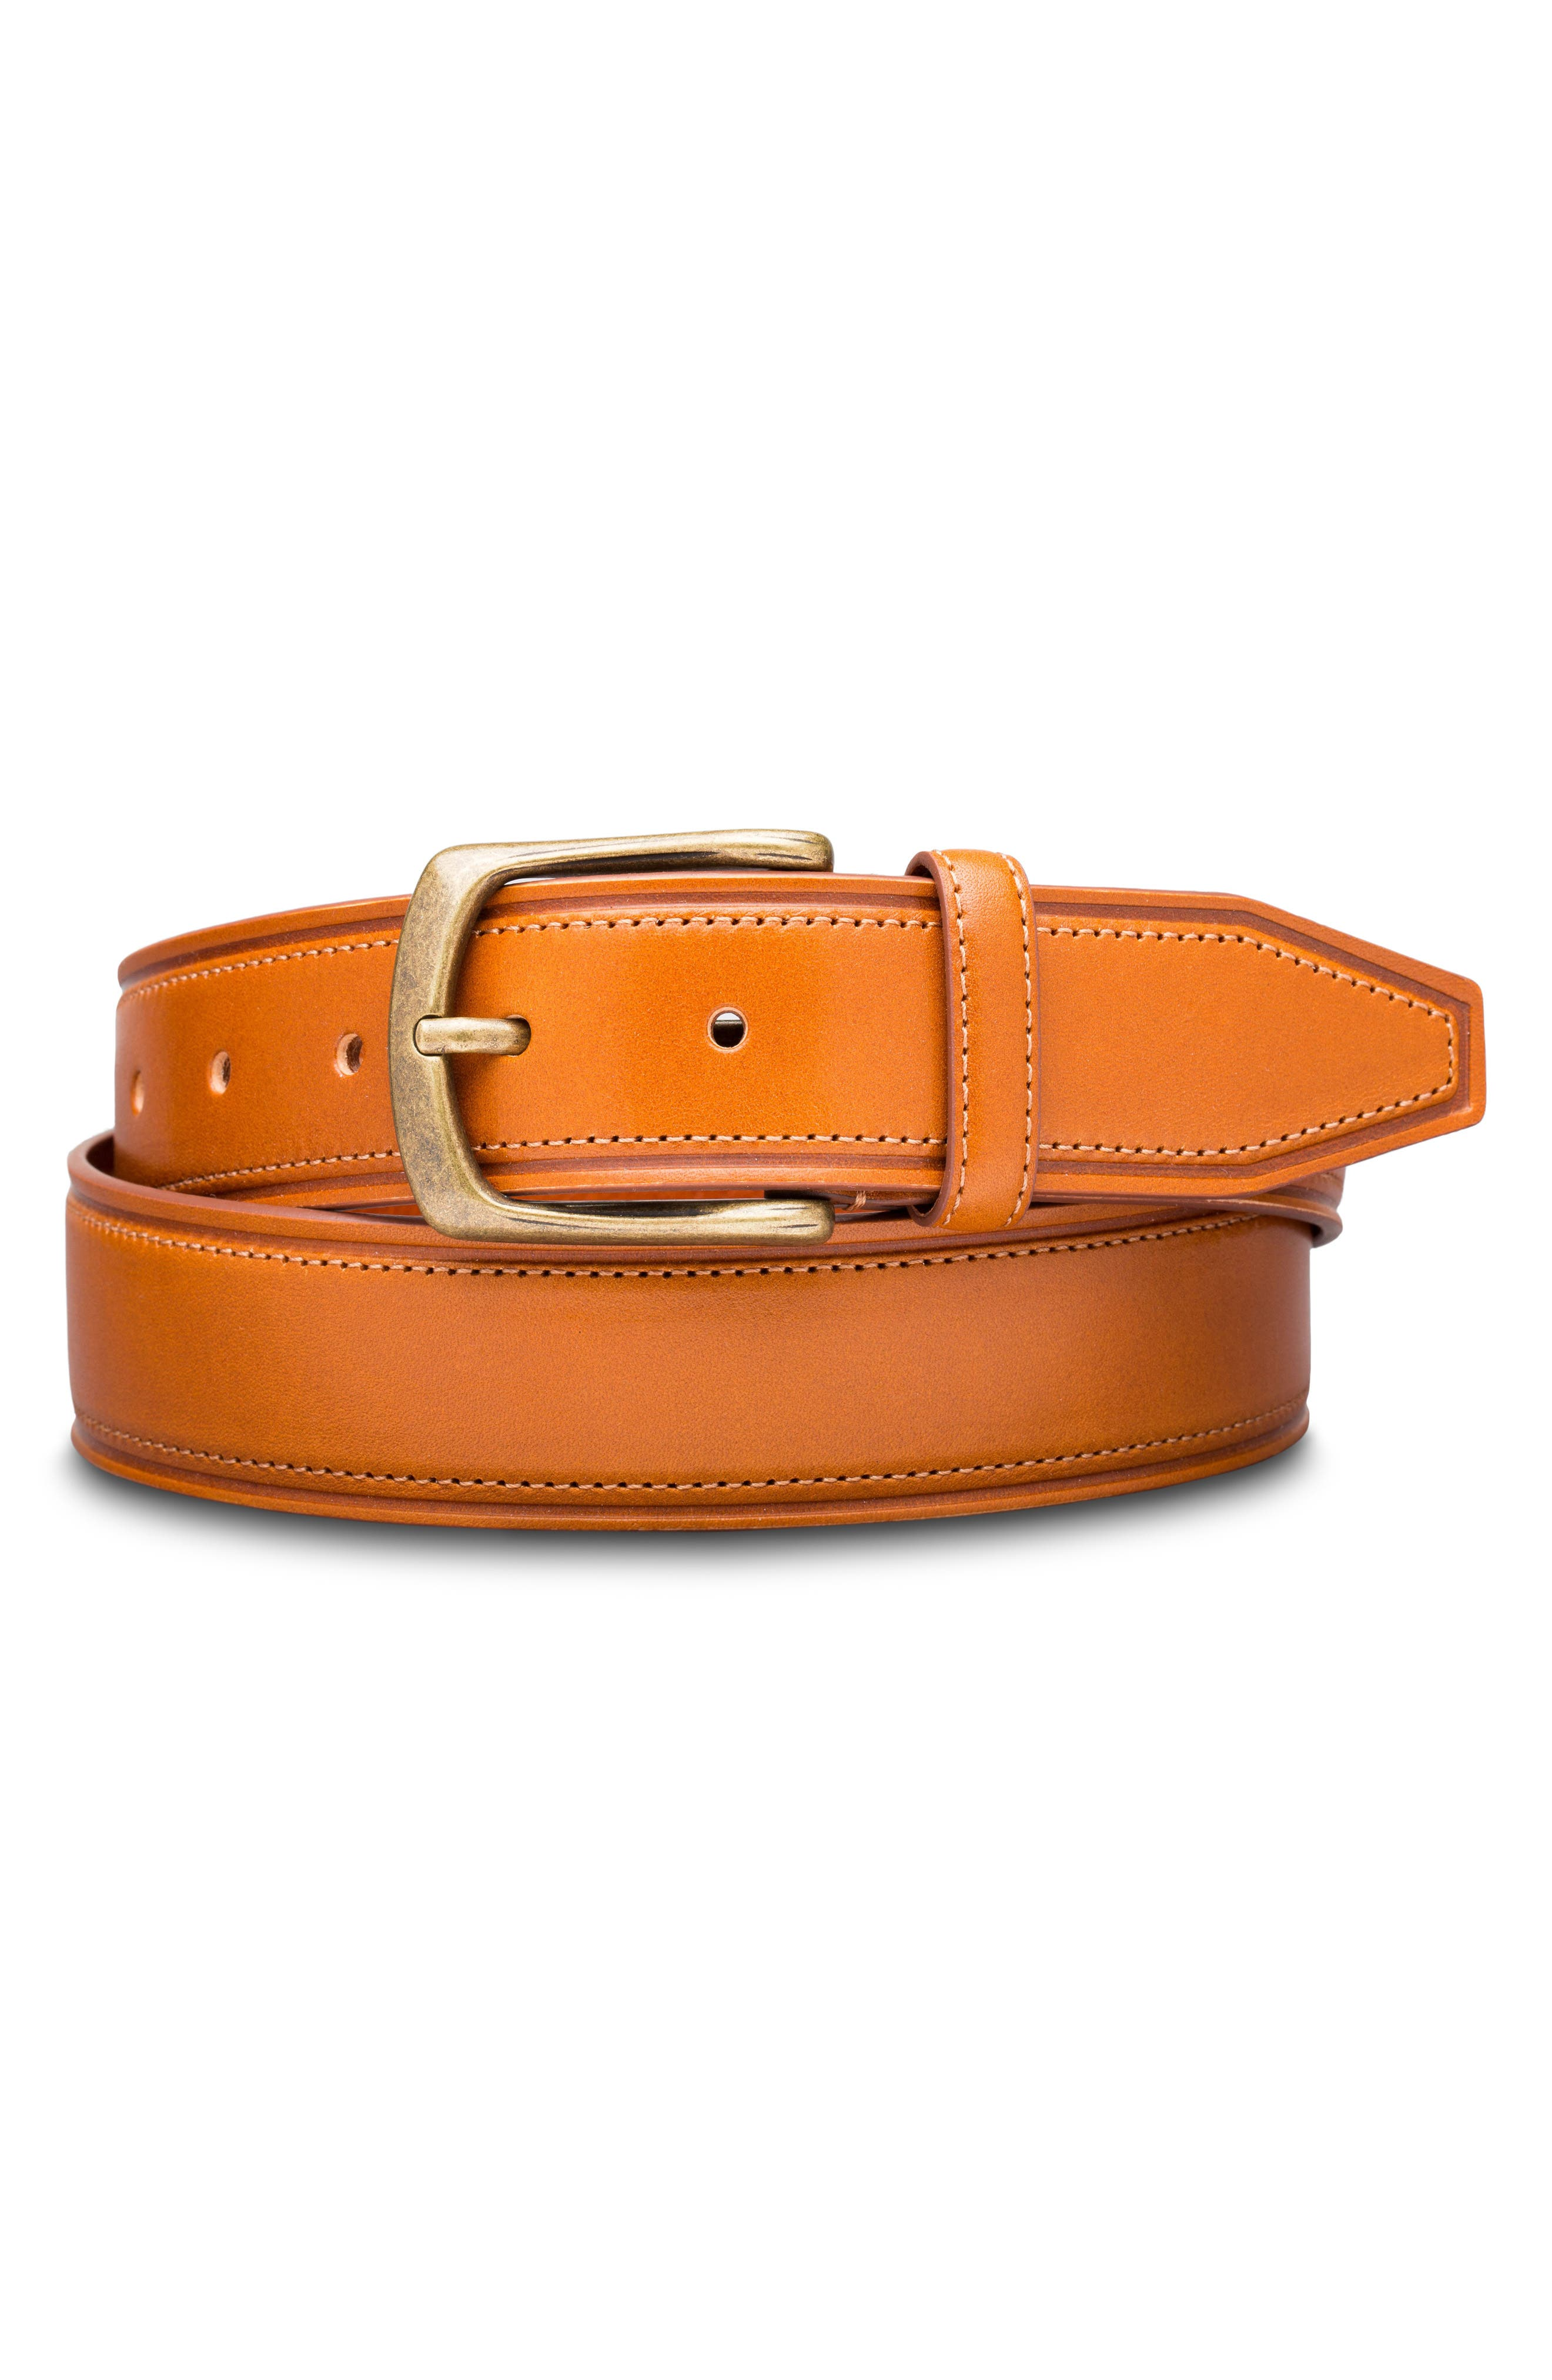 Palermo Leather Belt